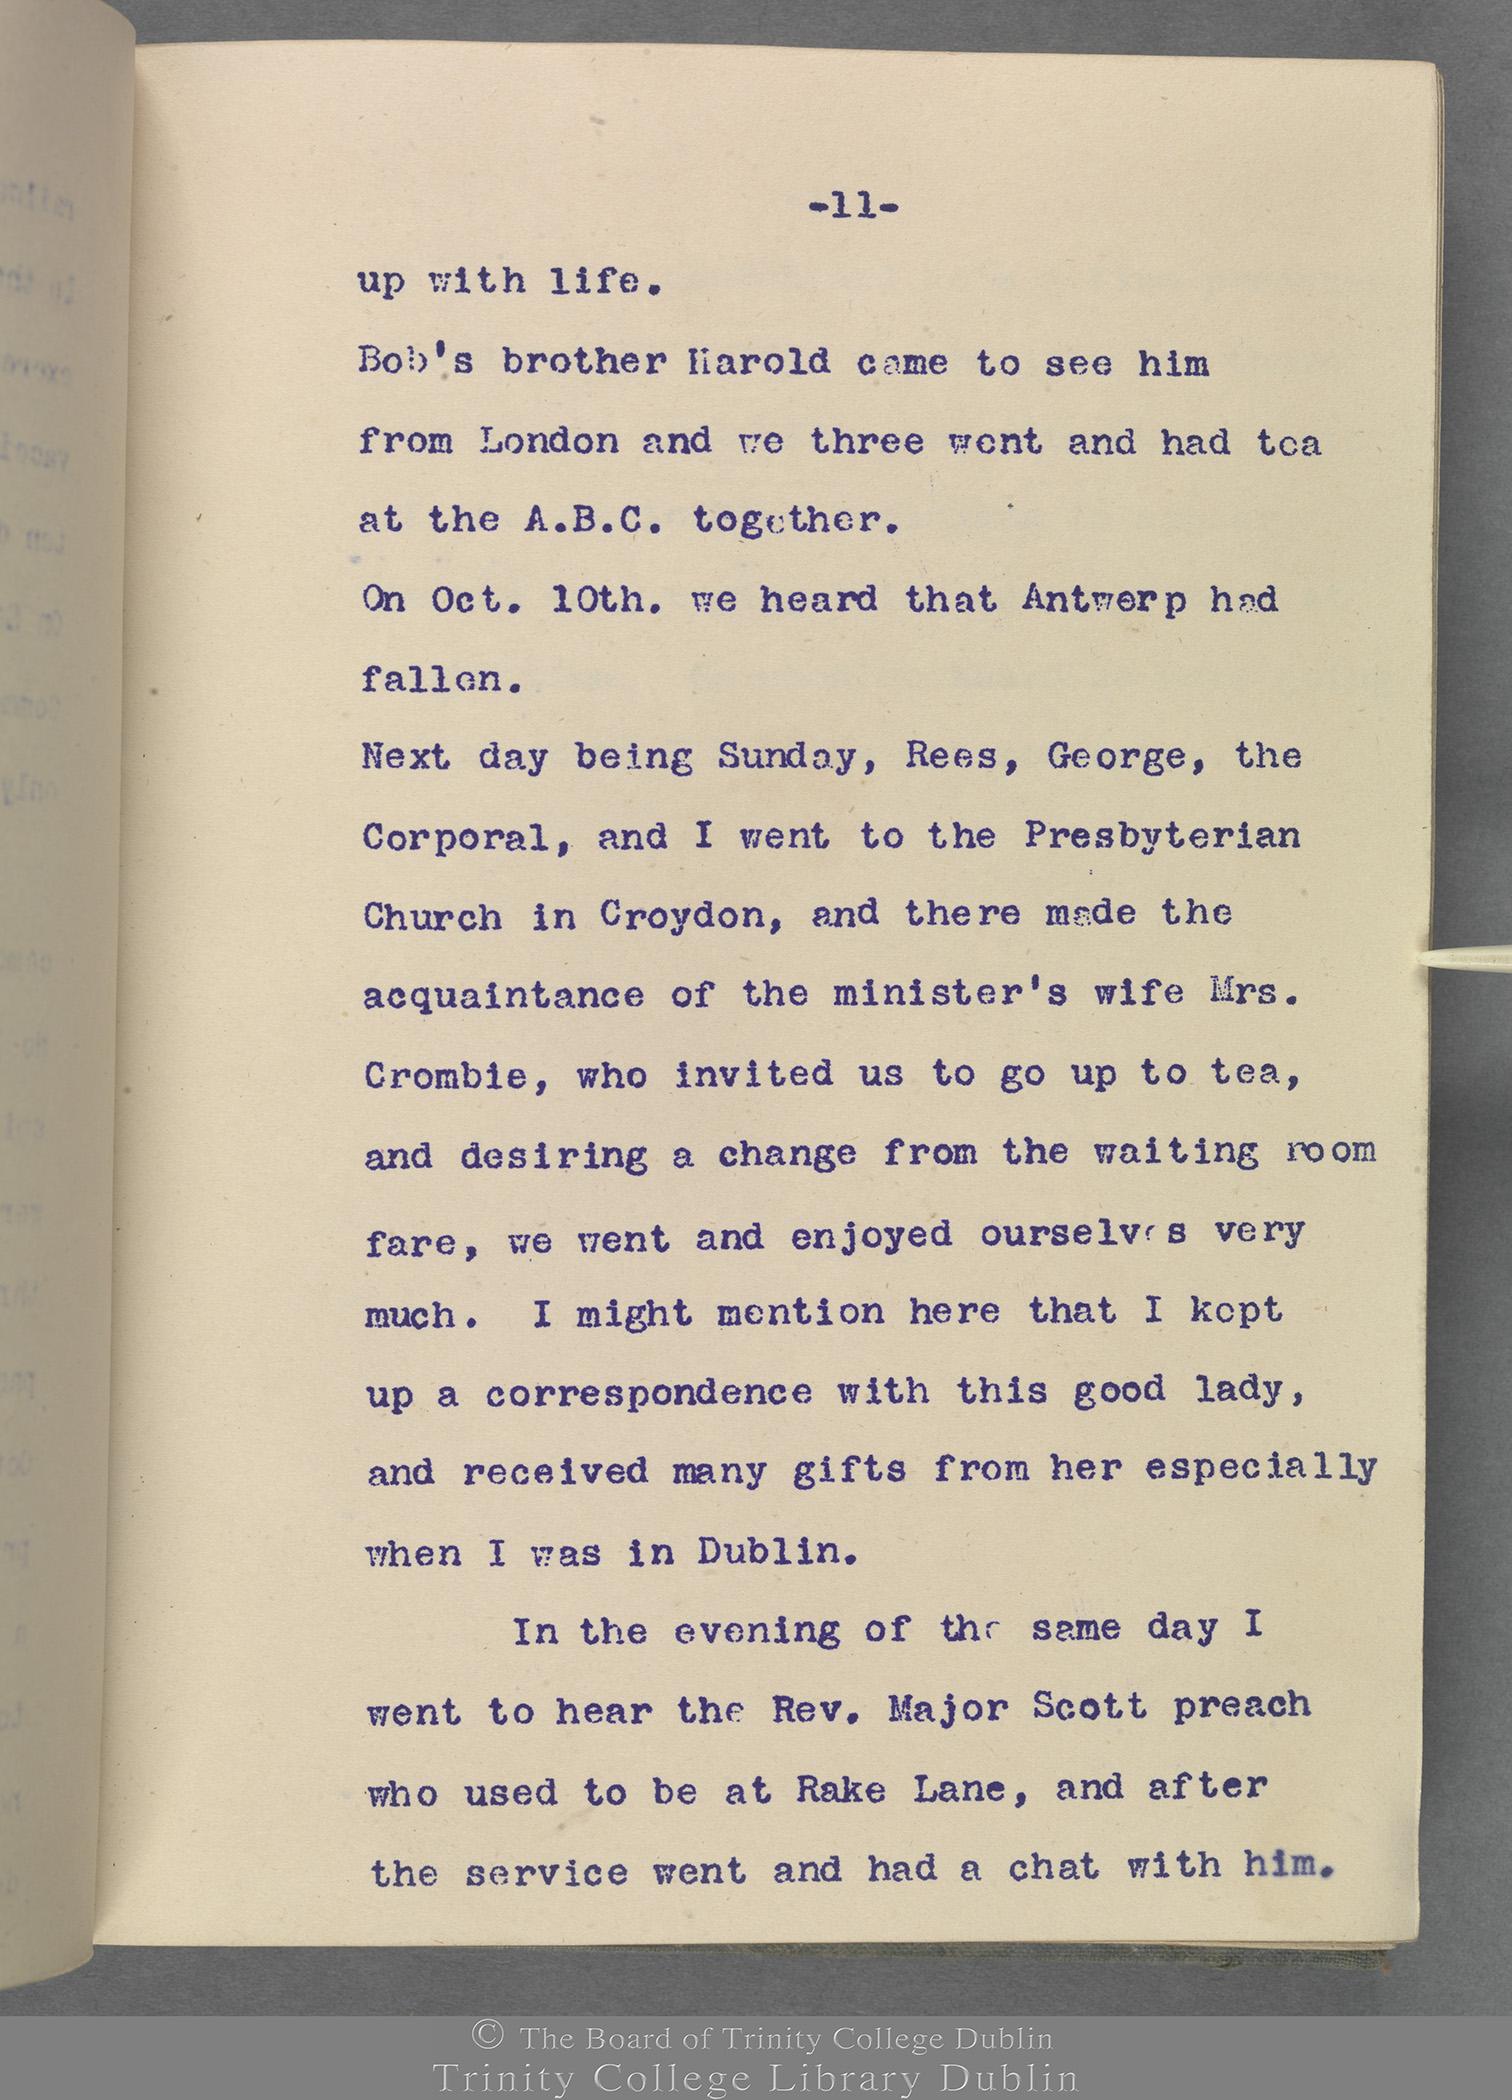 TCD MS 10853 folio 11 recto